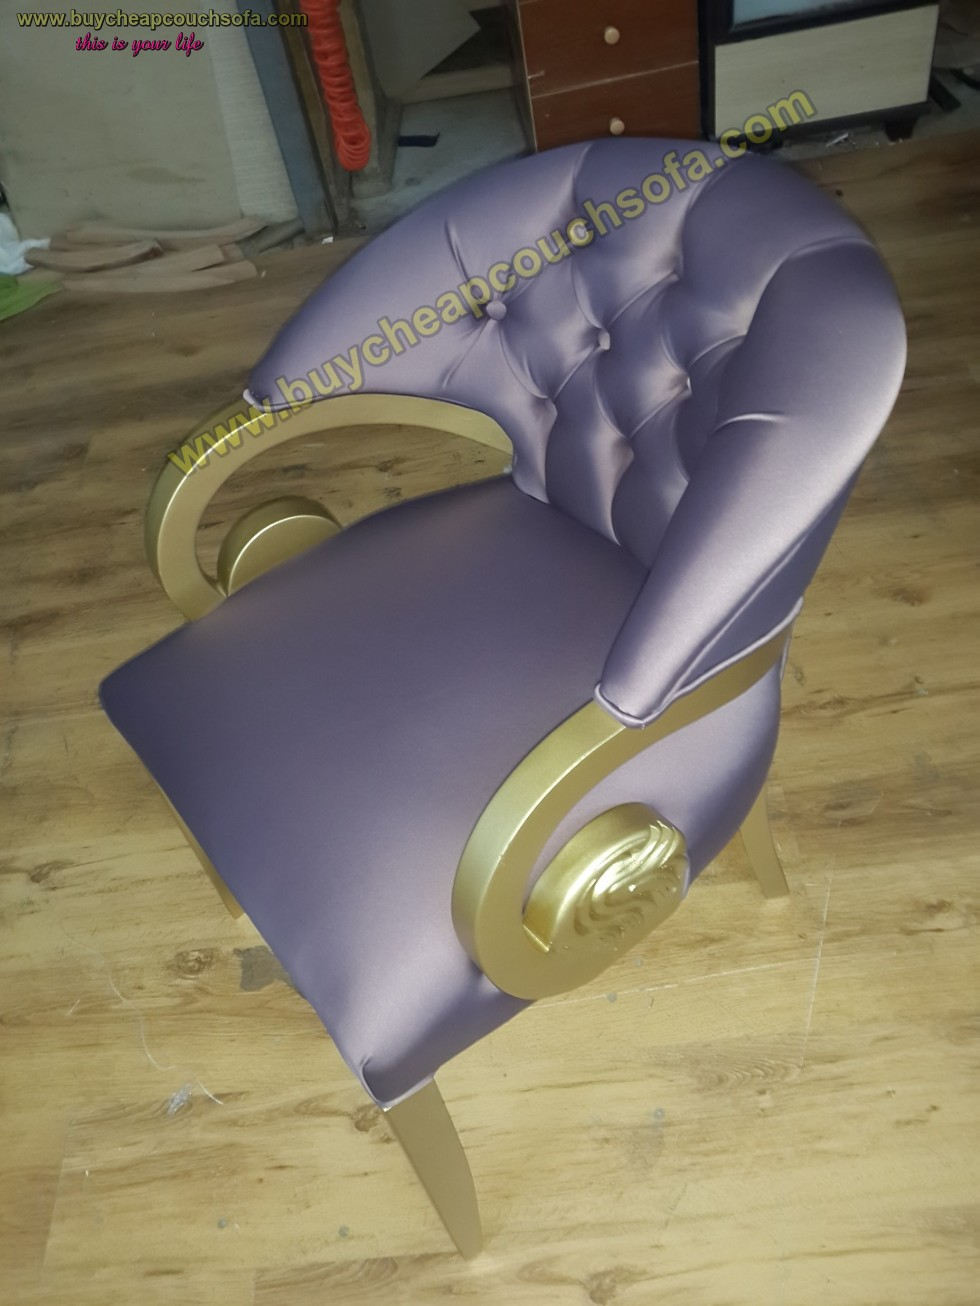 Kodu: 10230 - Purple Velvet Armchair Accent Chair Wooden Chair Tufted Luxury